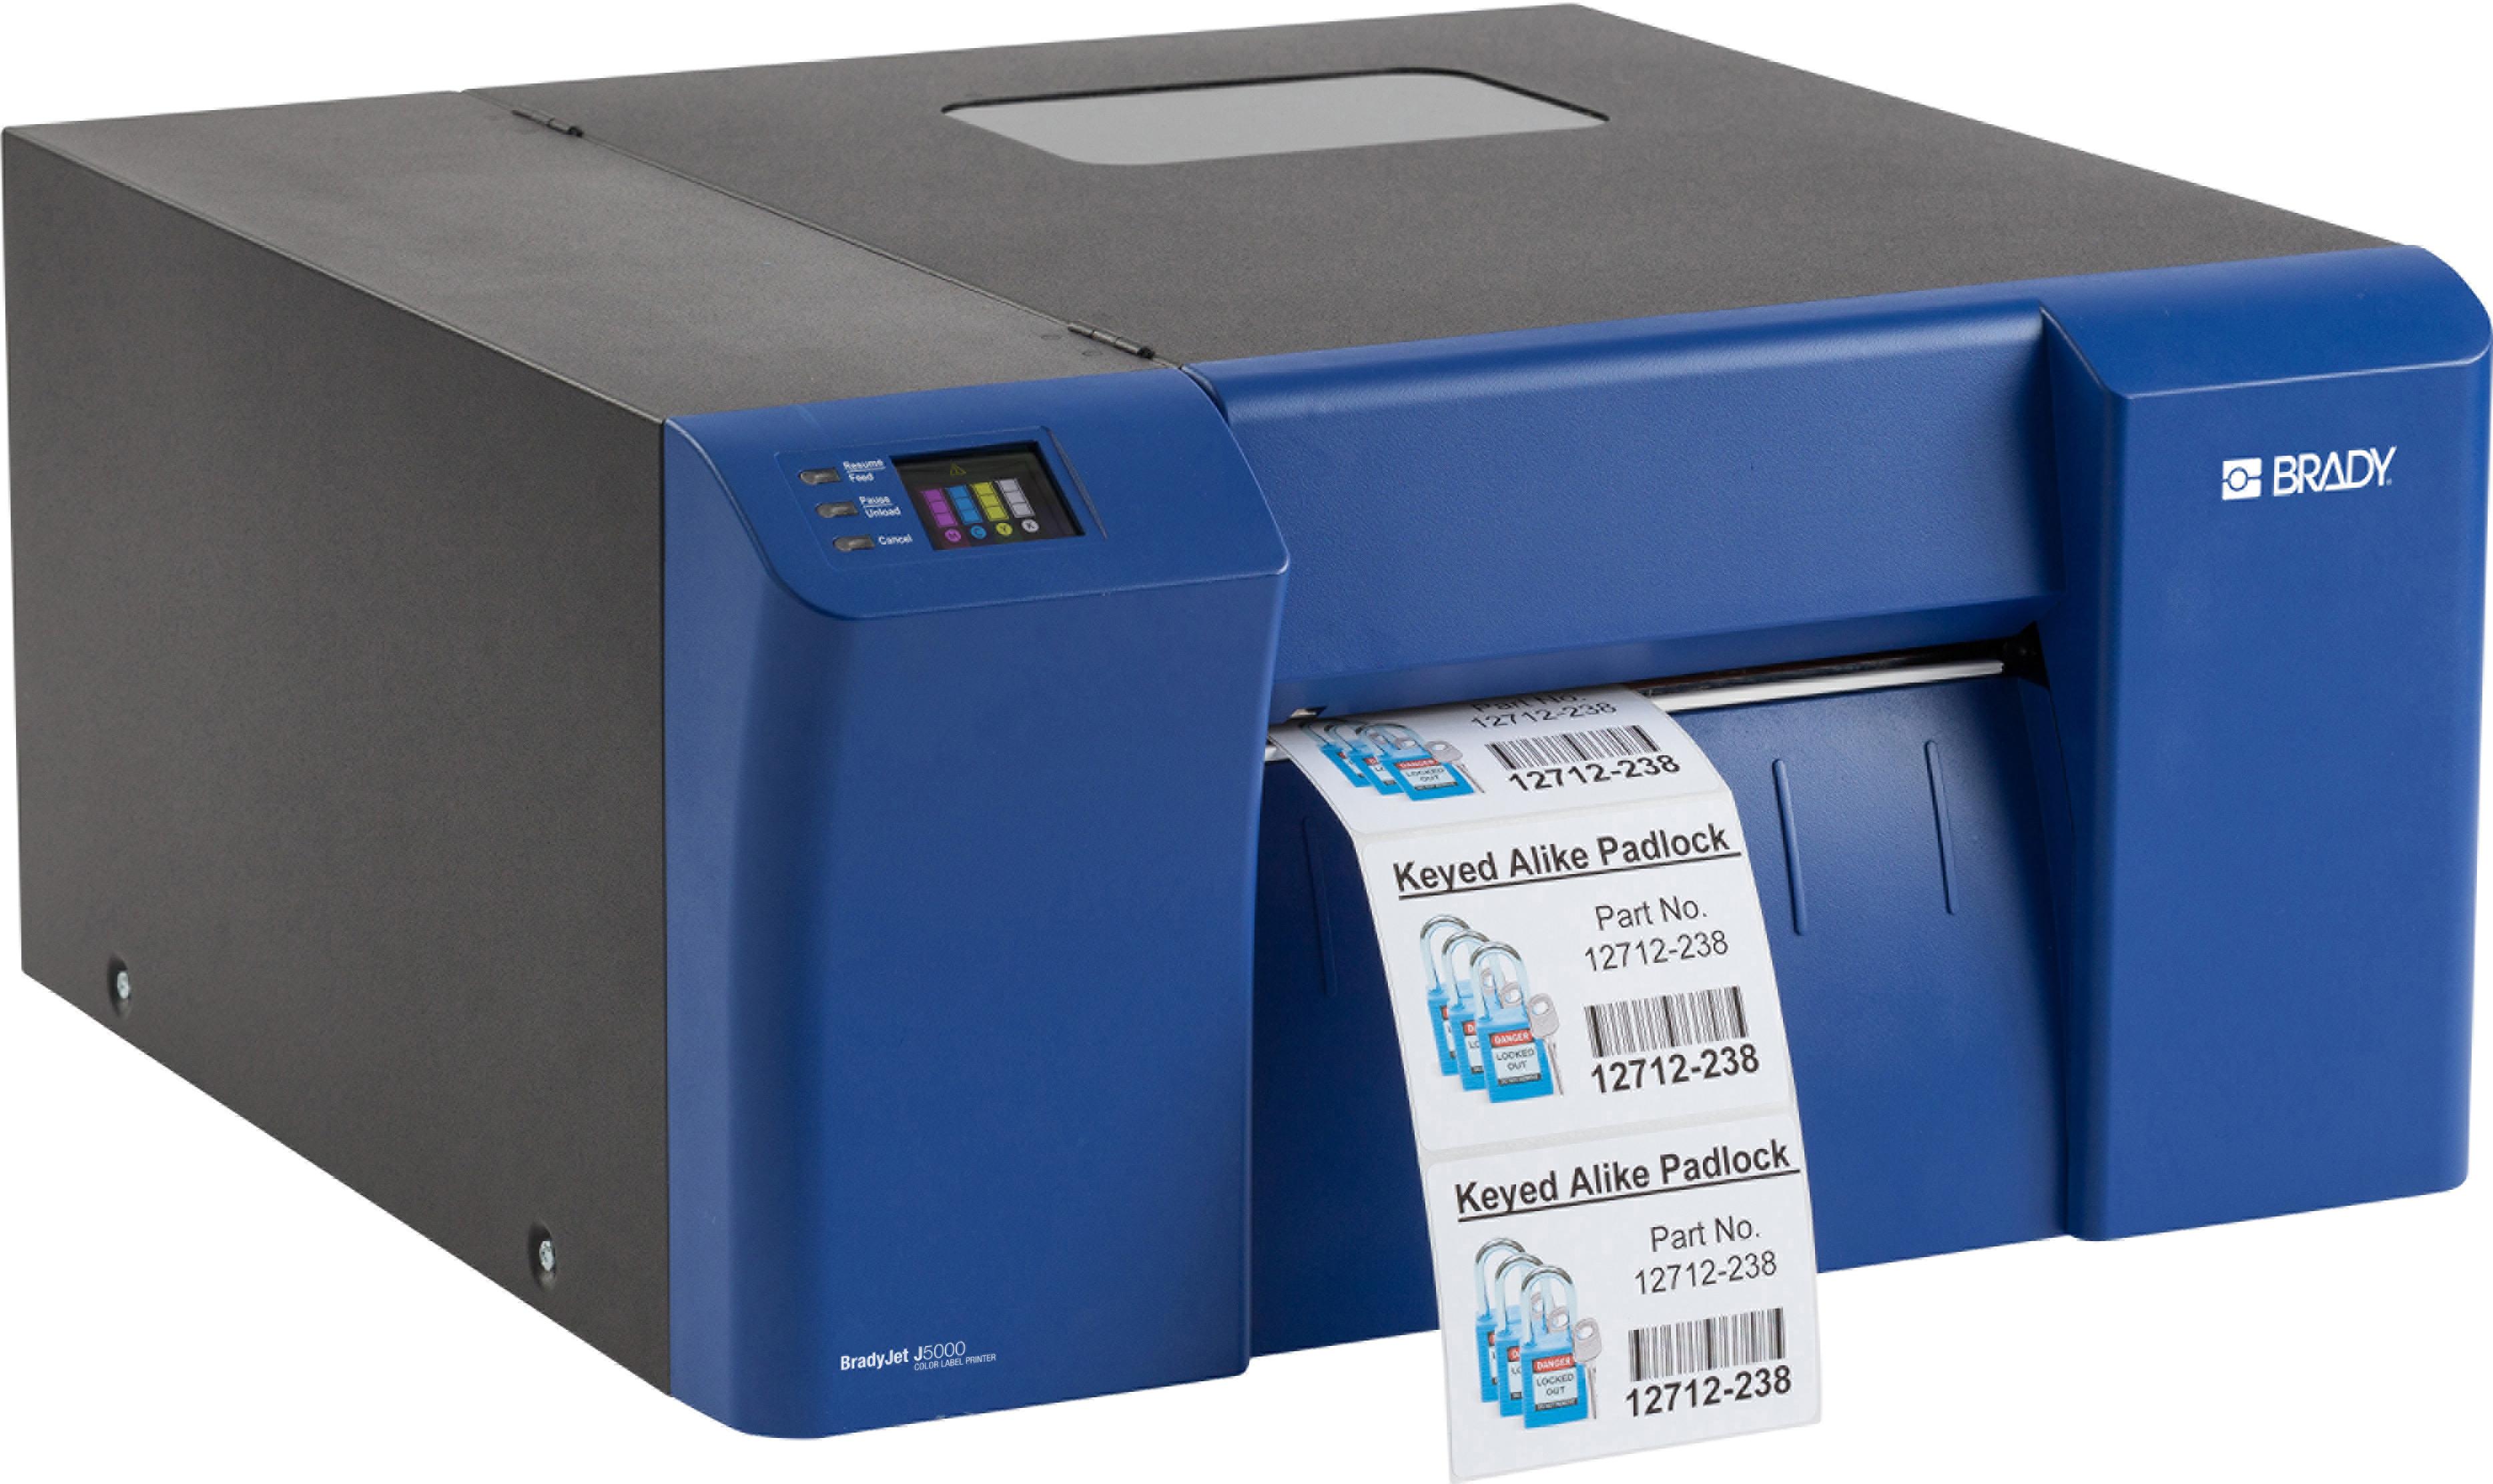 Imprimante Brady : J5000